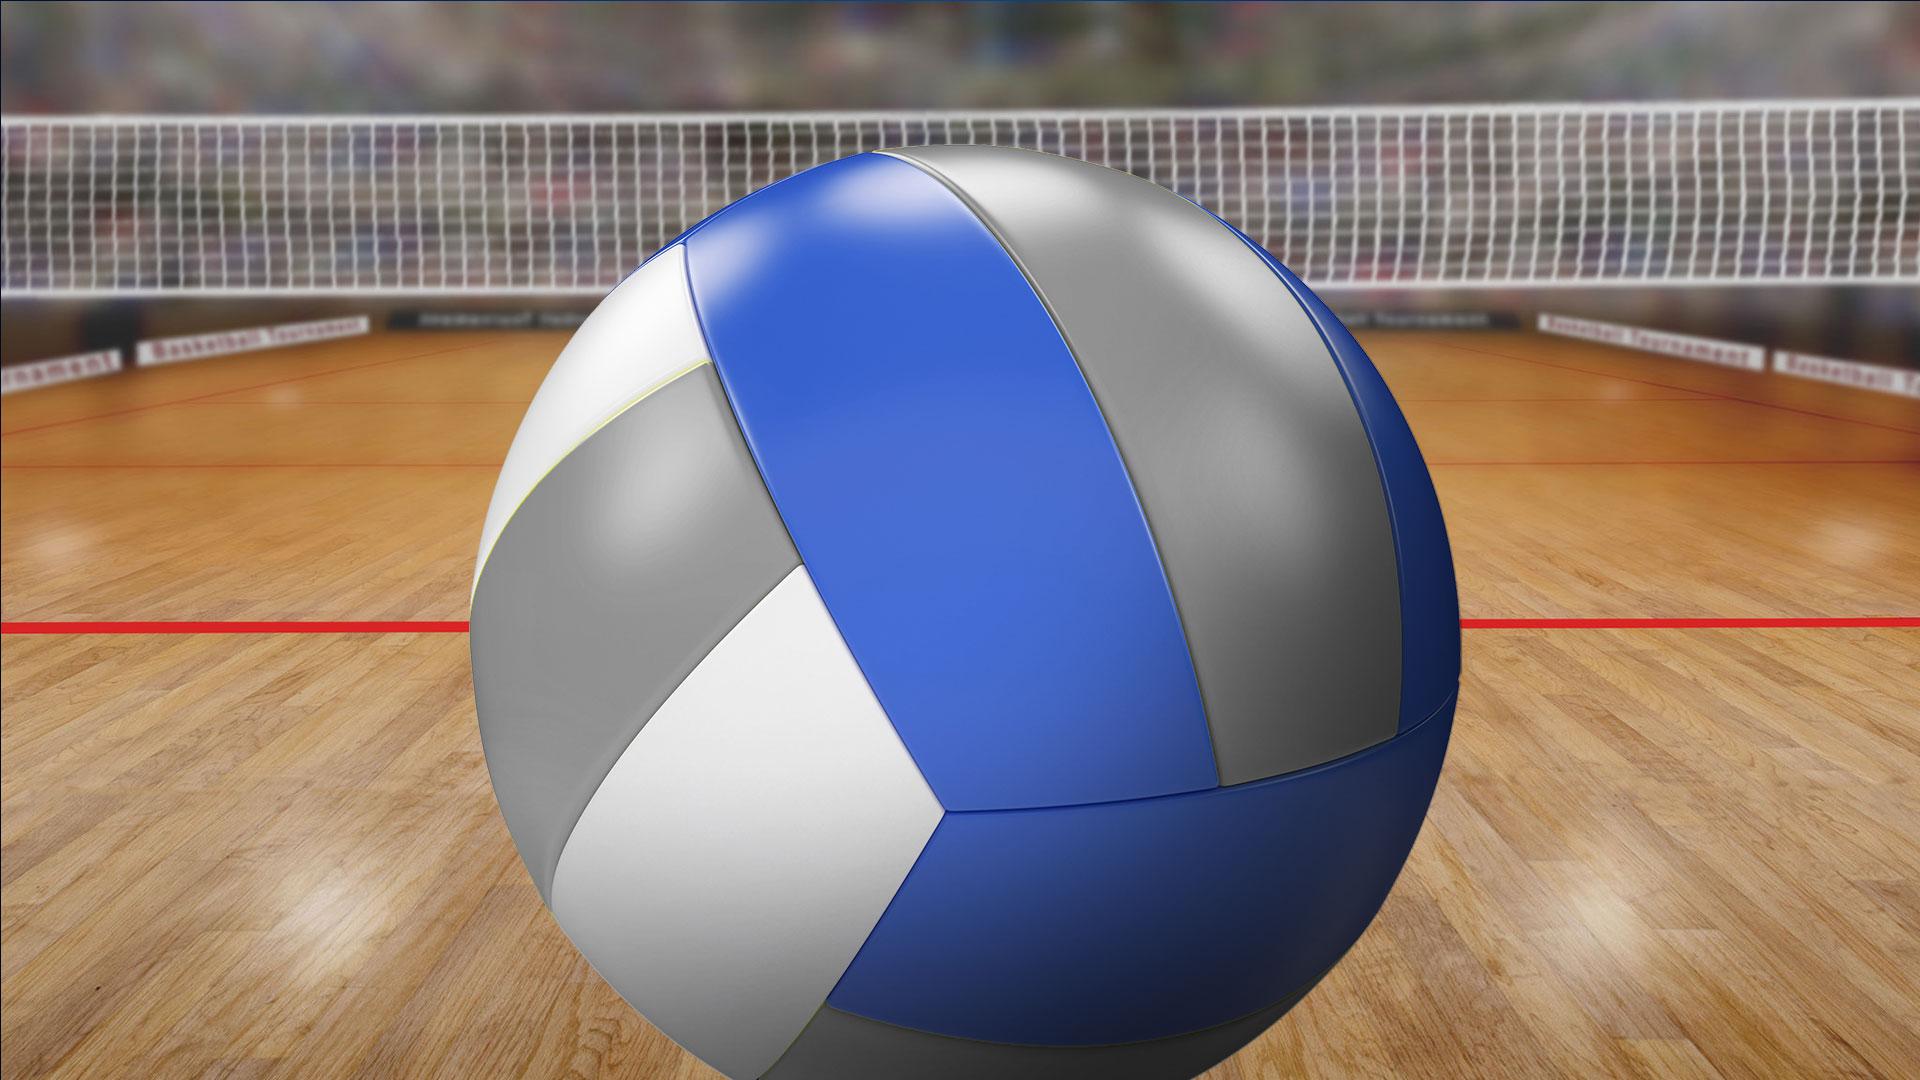 KELO-sports-generic-volleyball_1529437995484.jpg